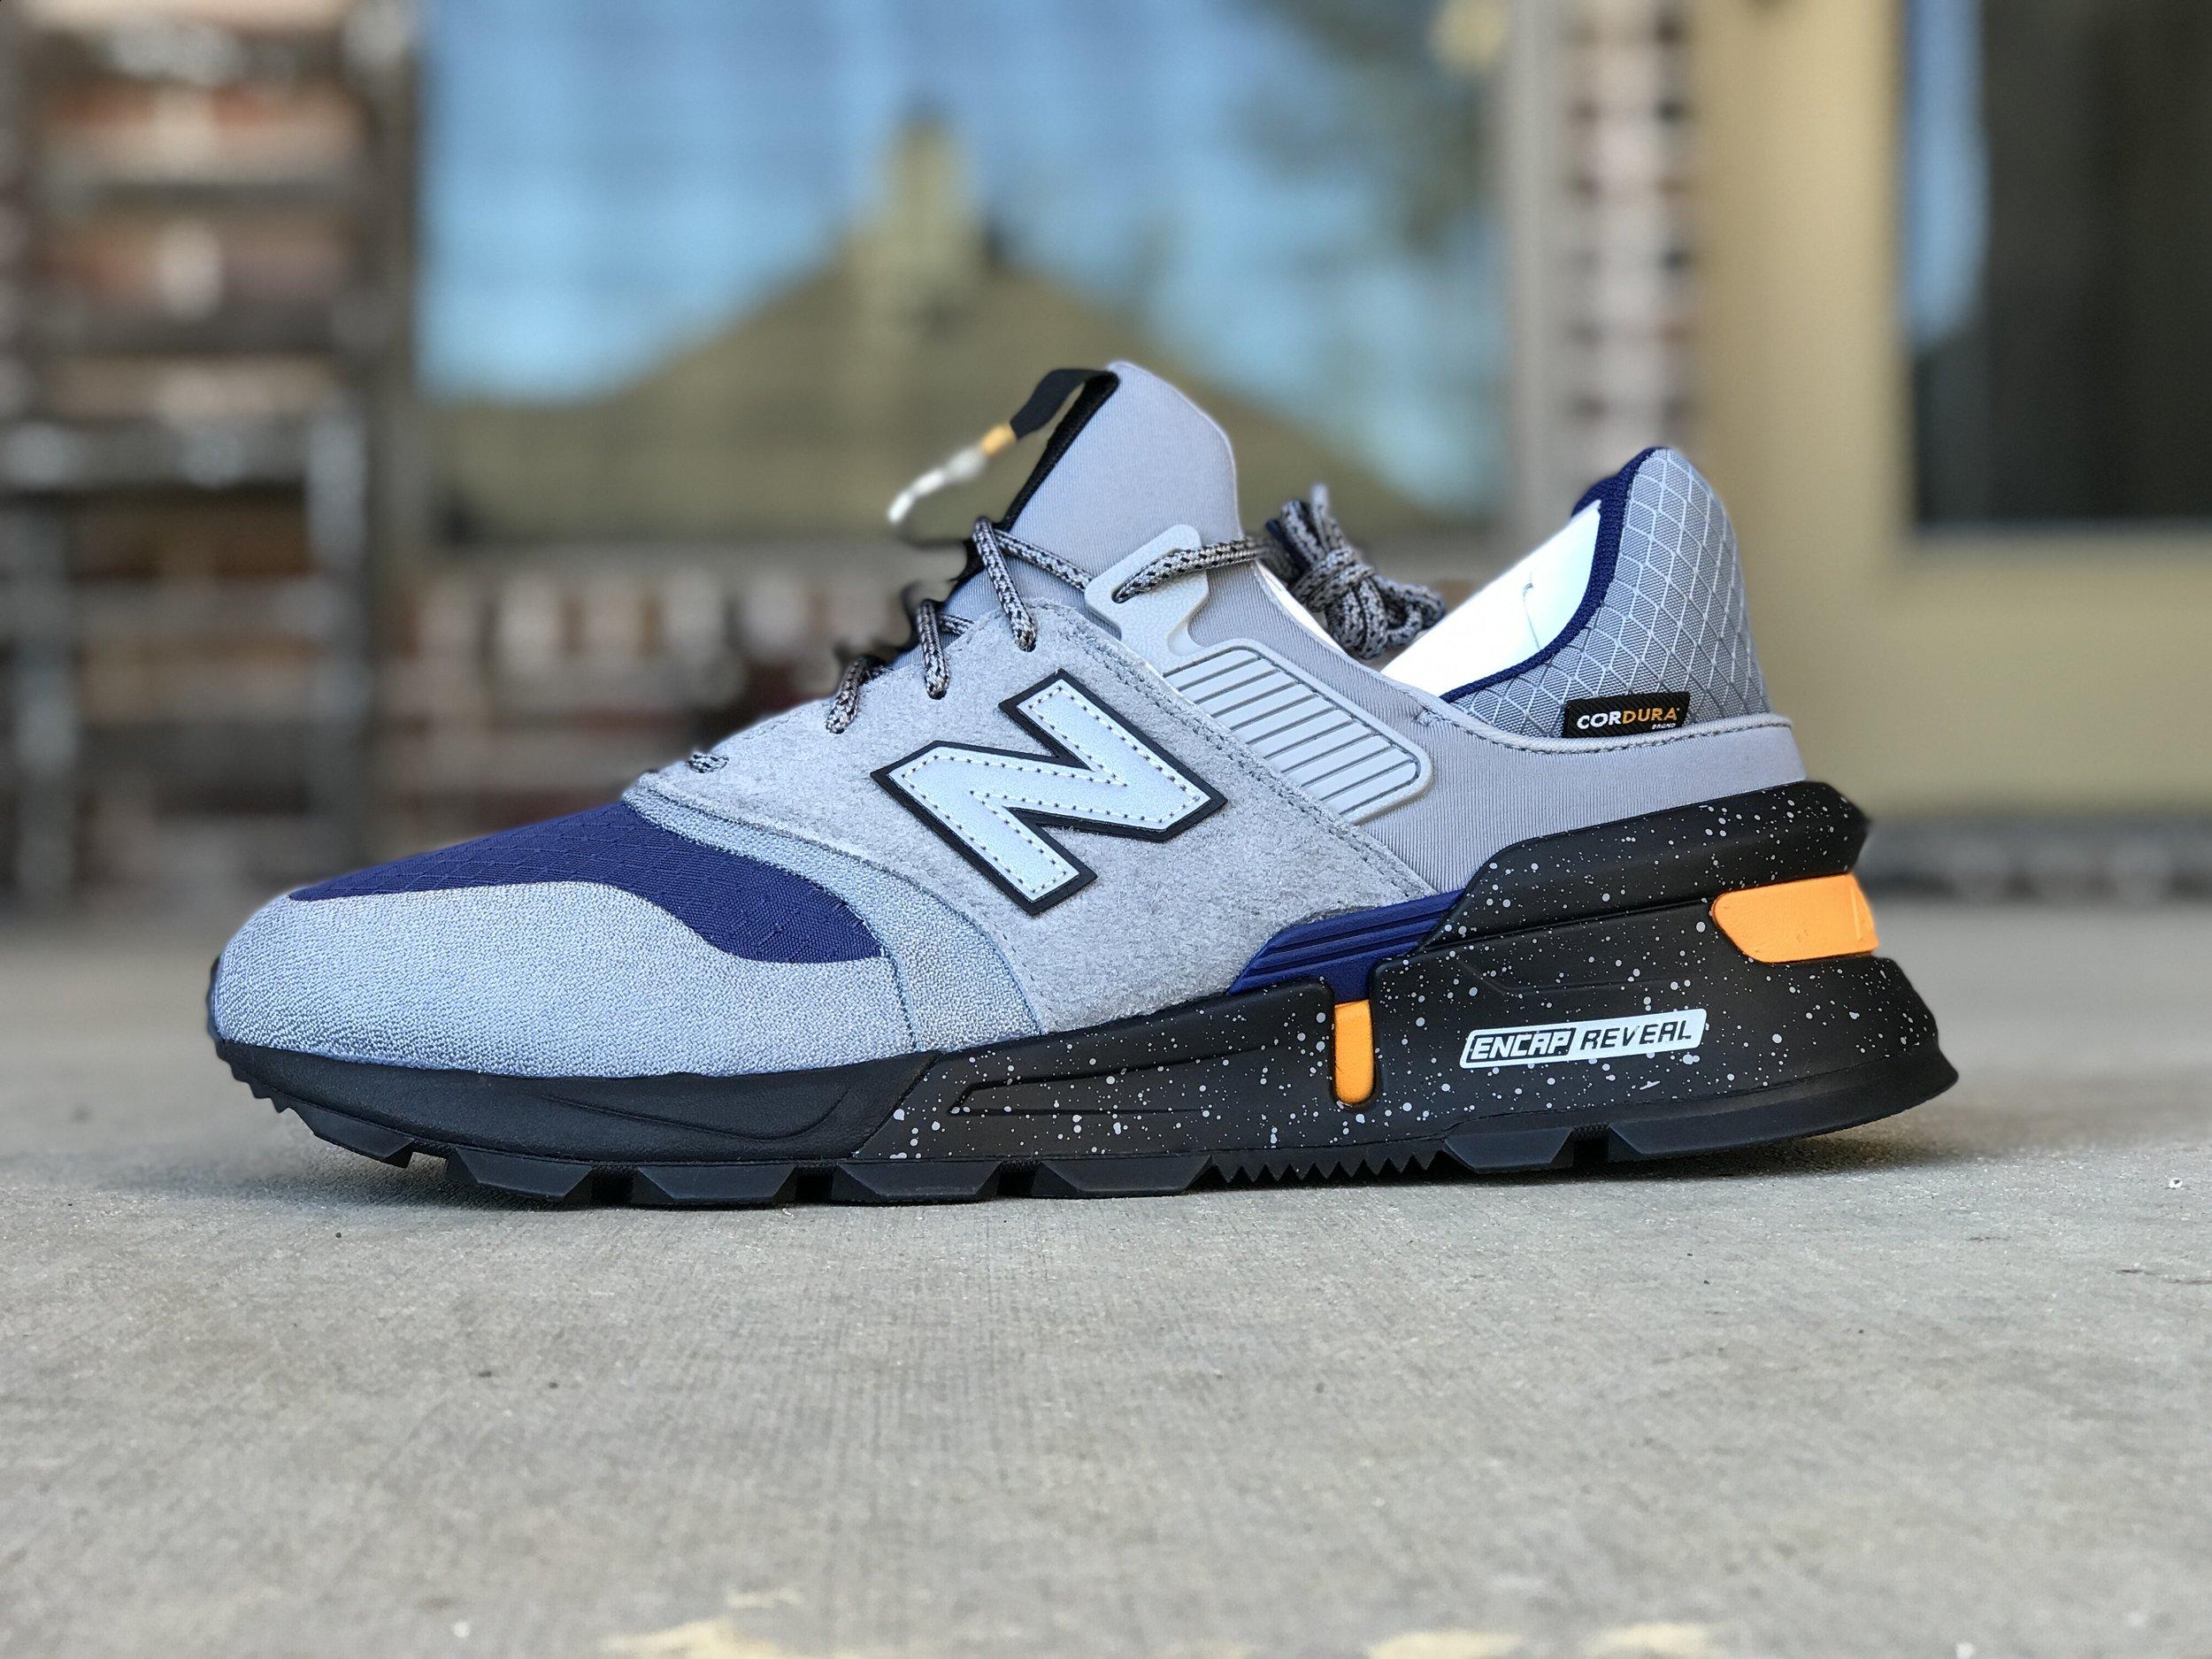 new balance 997 reddit